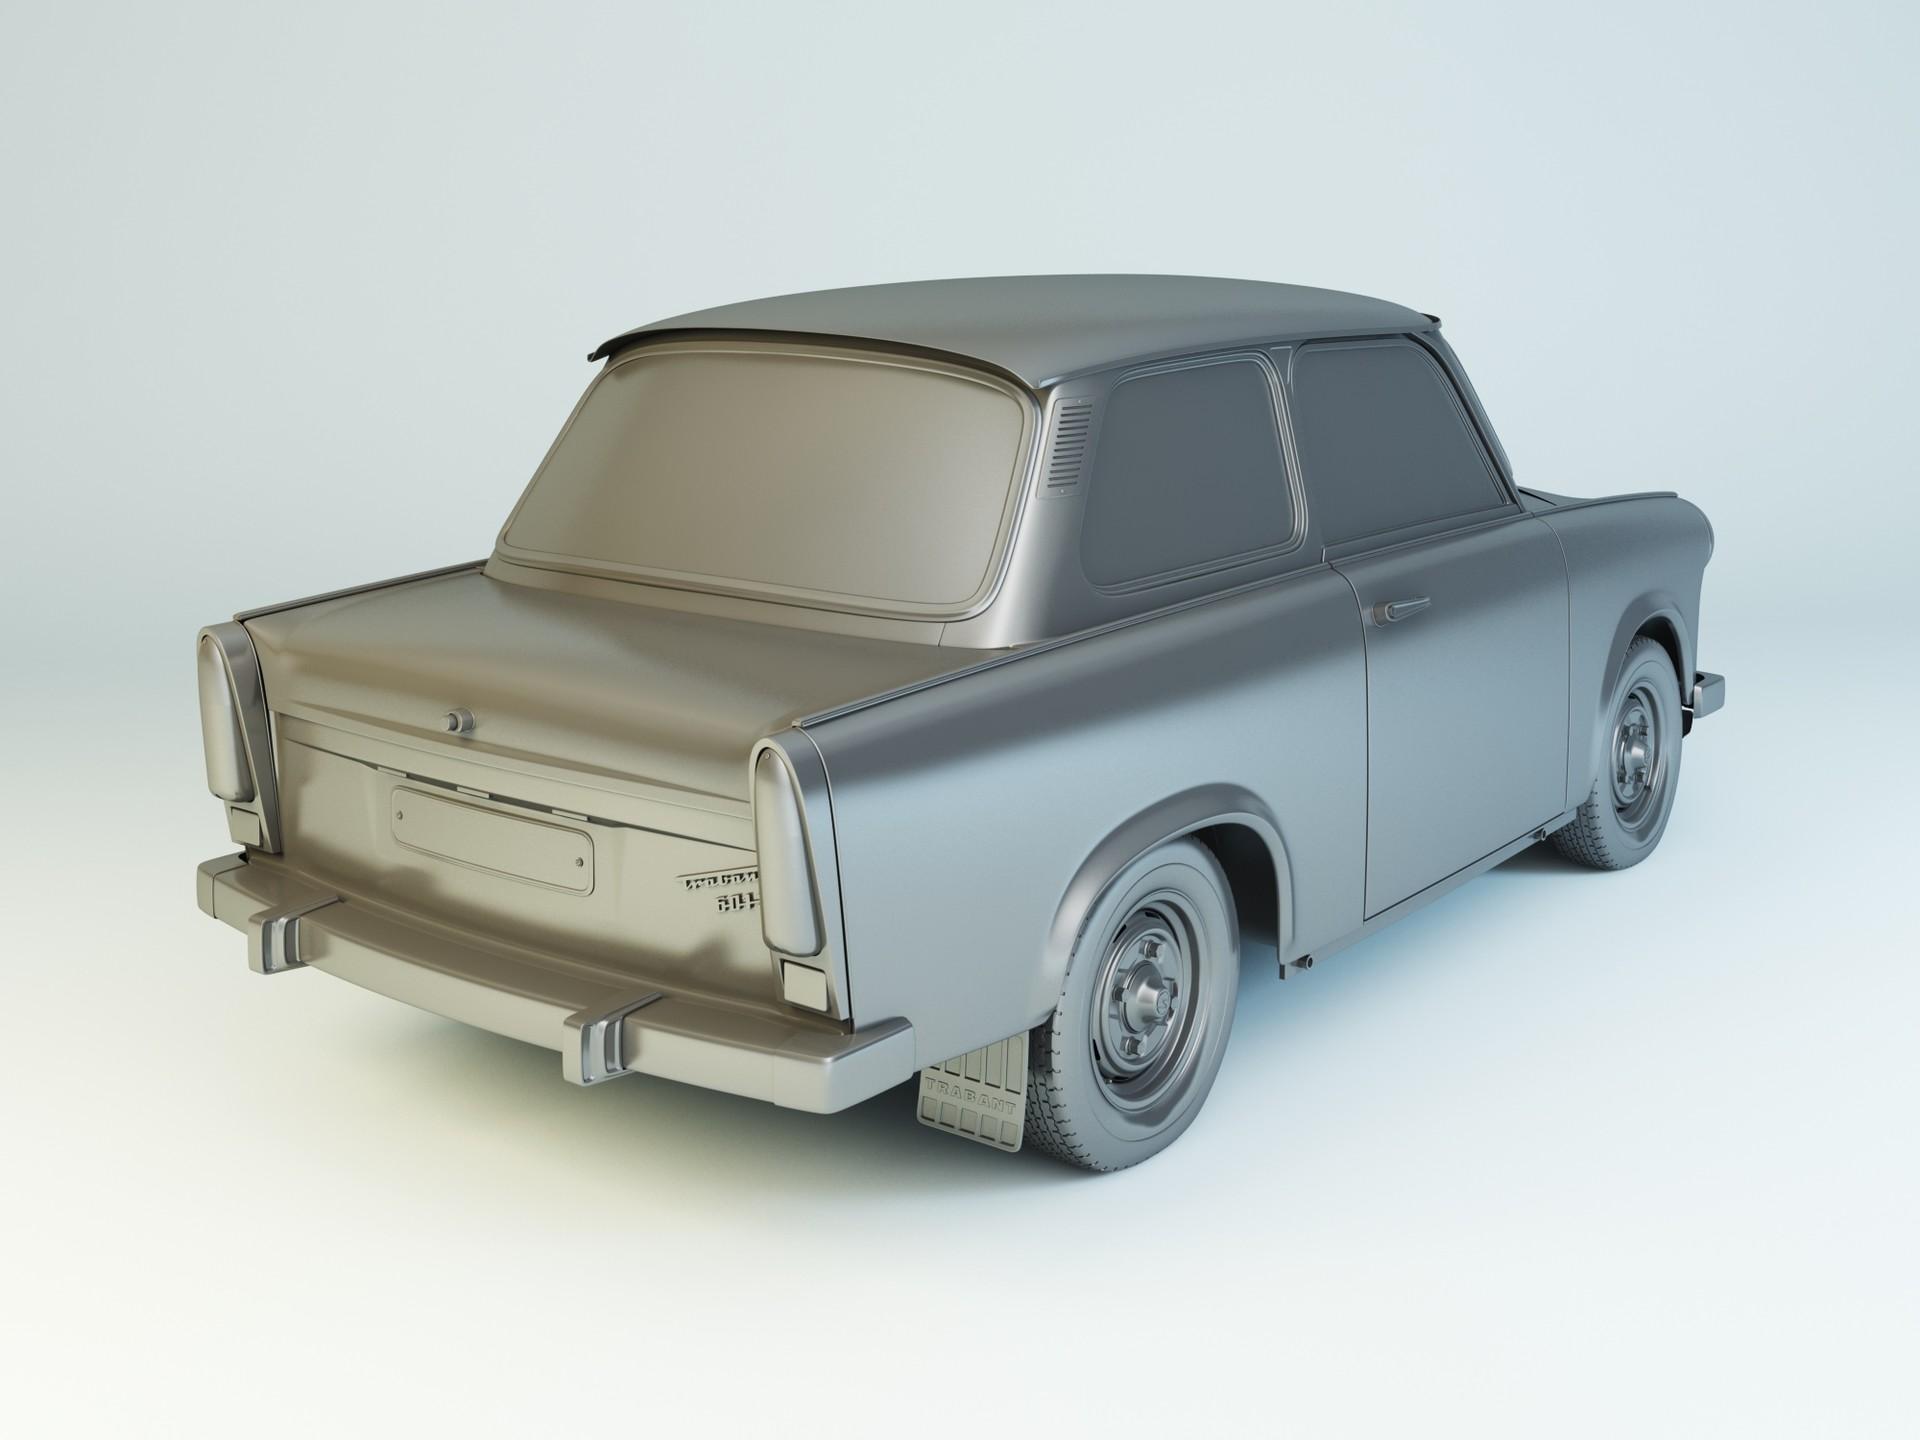 Nail khusnutdinov zals 151 000 trabant 601 limo modelling 1